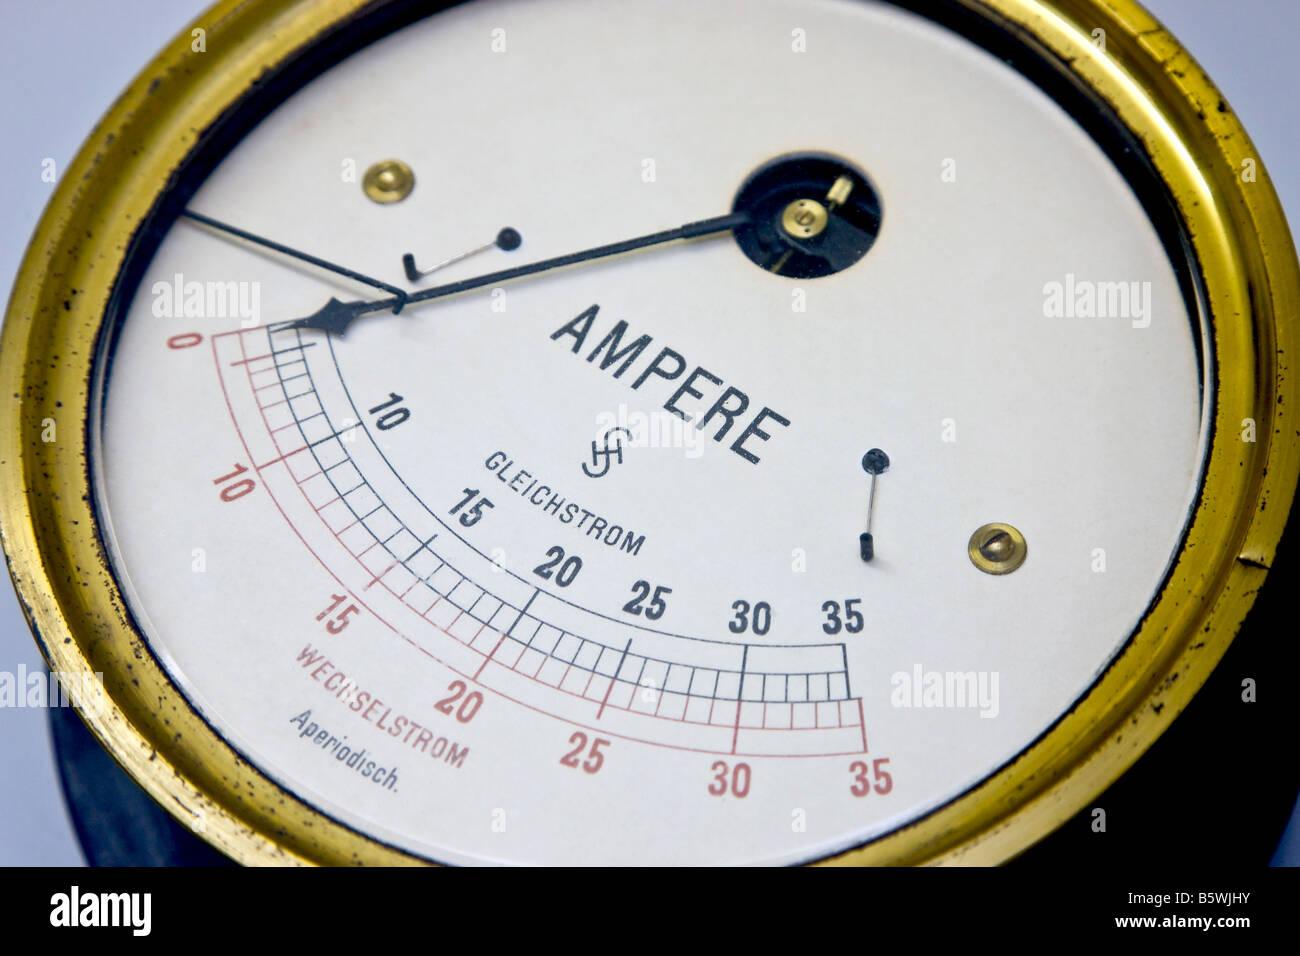 Ziemlich Elektrische Drahtstärke Amperemeter Ideen - Schaltplan ...